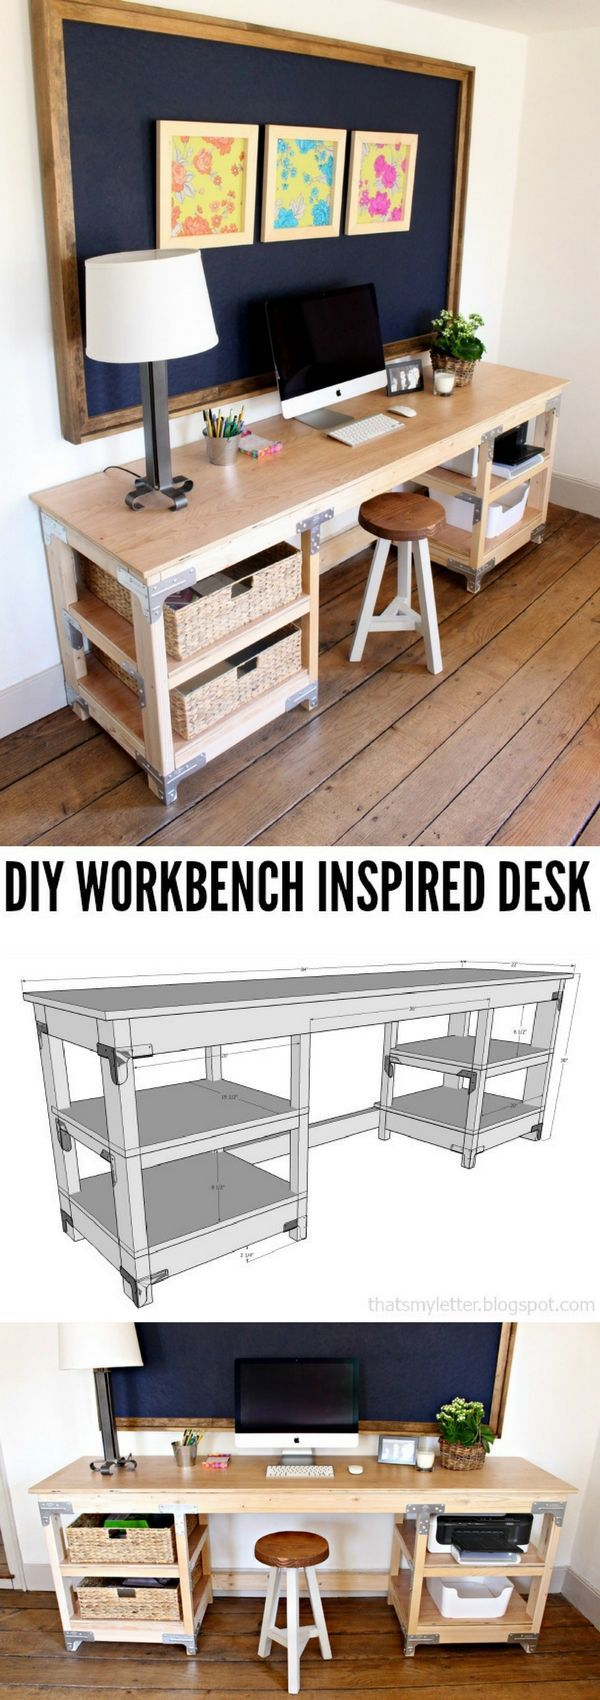 Best 25 diy workbench ideas on pinterest garage diy for Building a garage on a budget